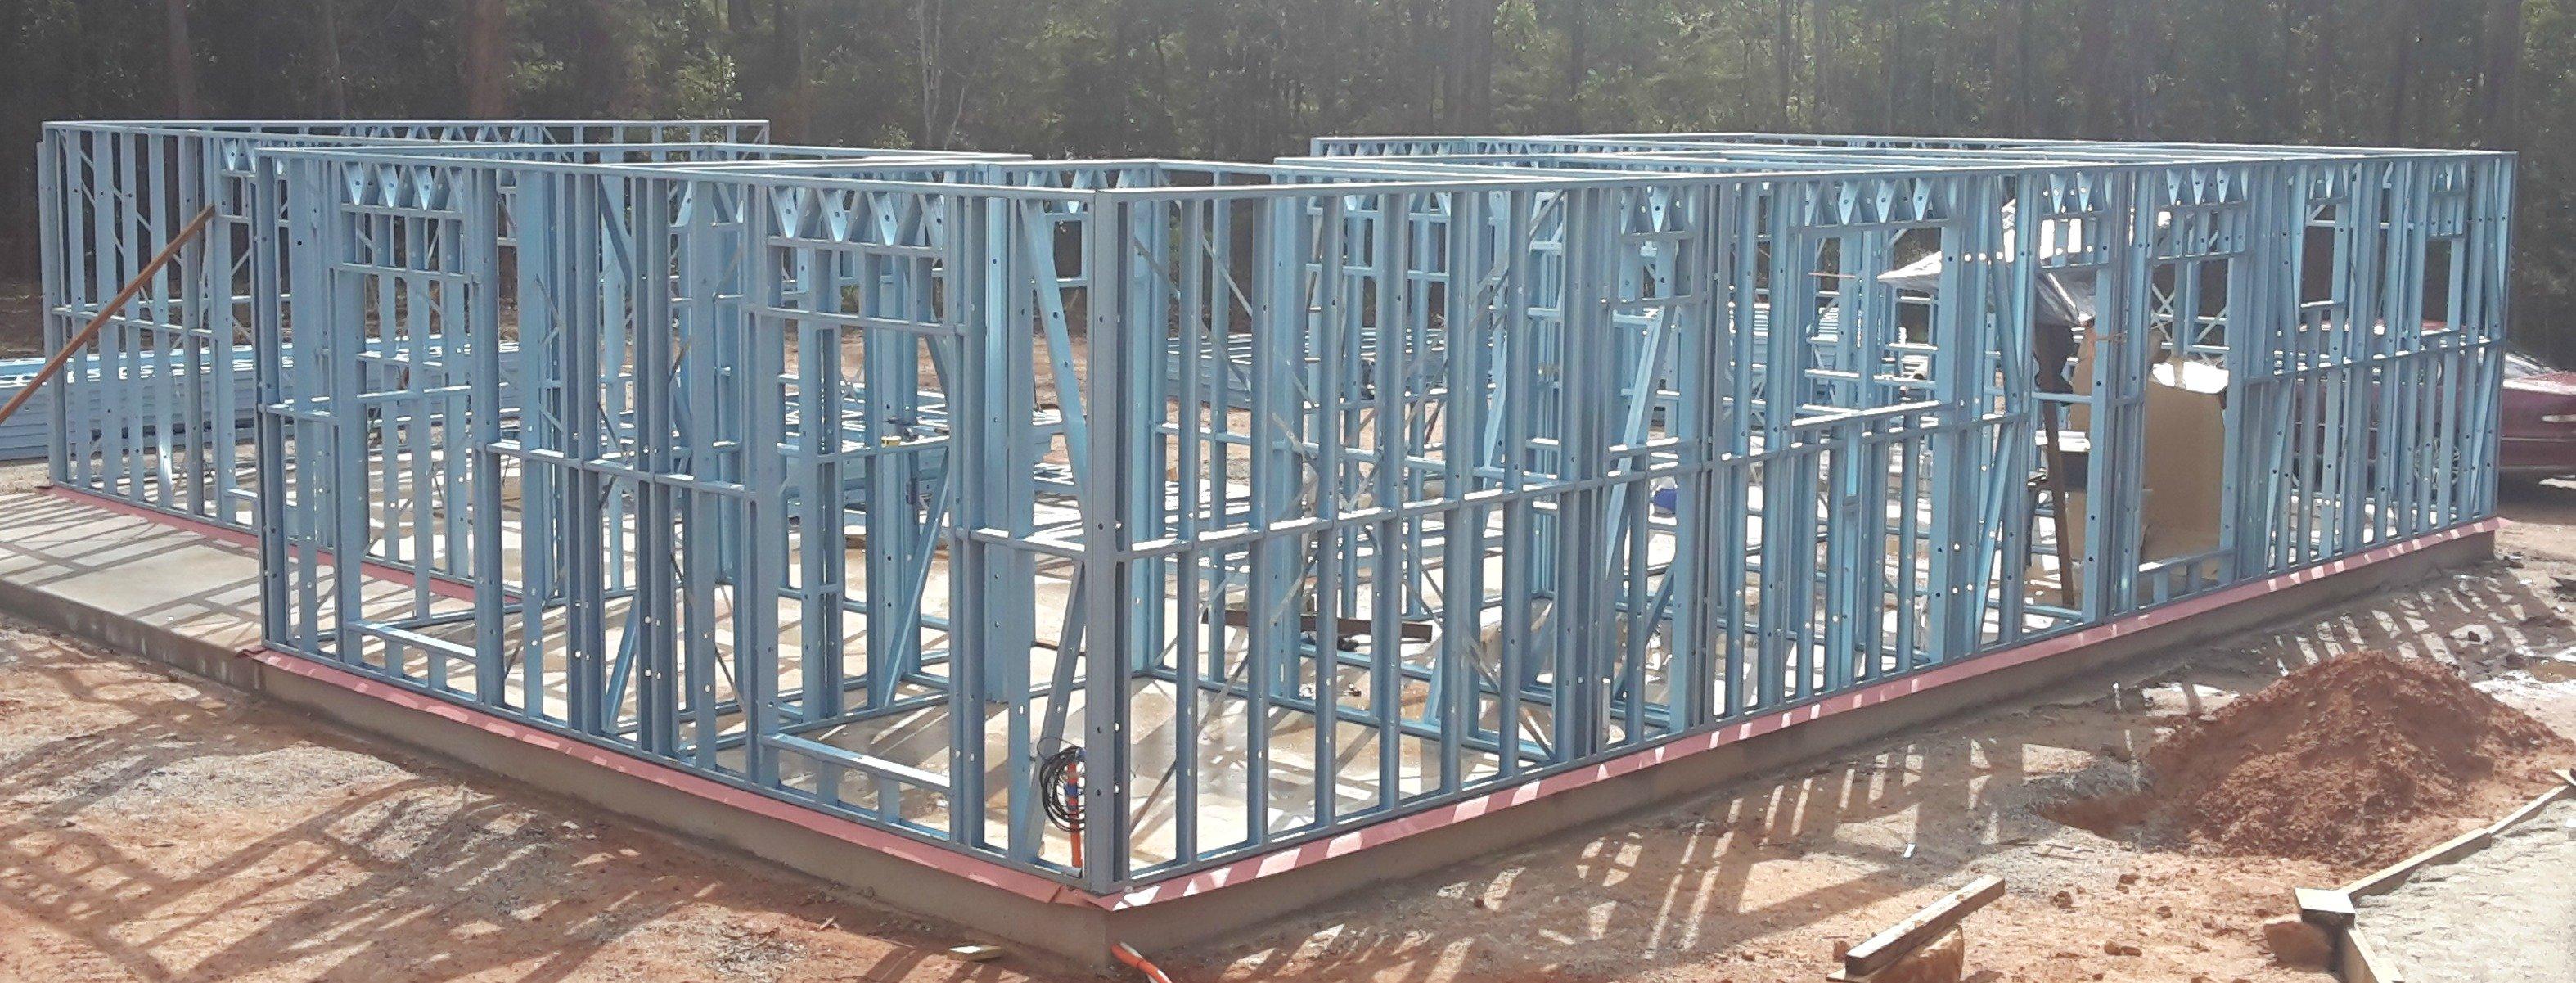 Erected steel kit home wall frames